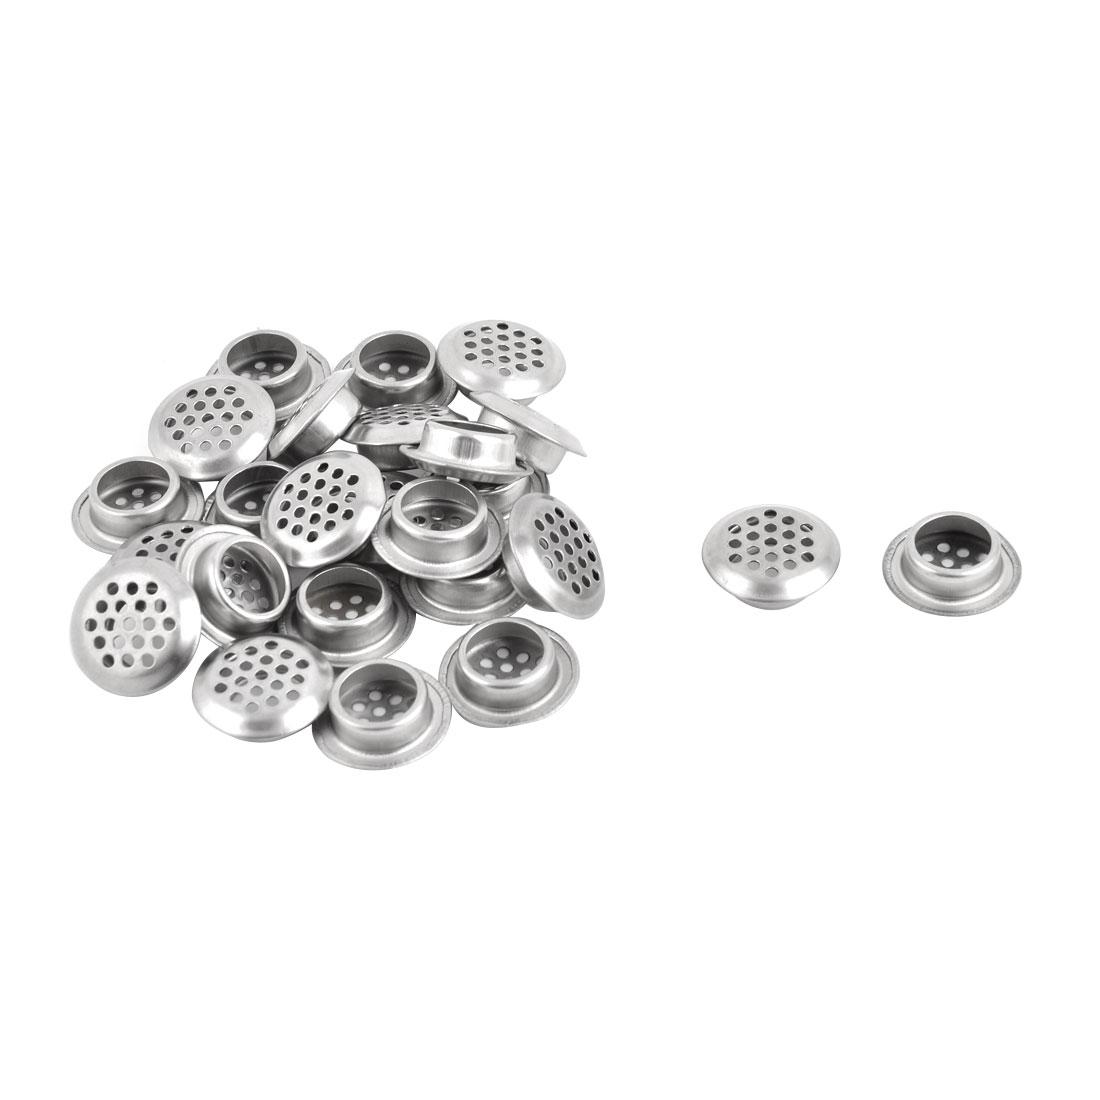 Kitchen Bathroom Stainless Steel Round Mesh Hole Sink Strainer Silver Tone 25pcs